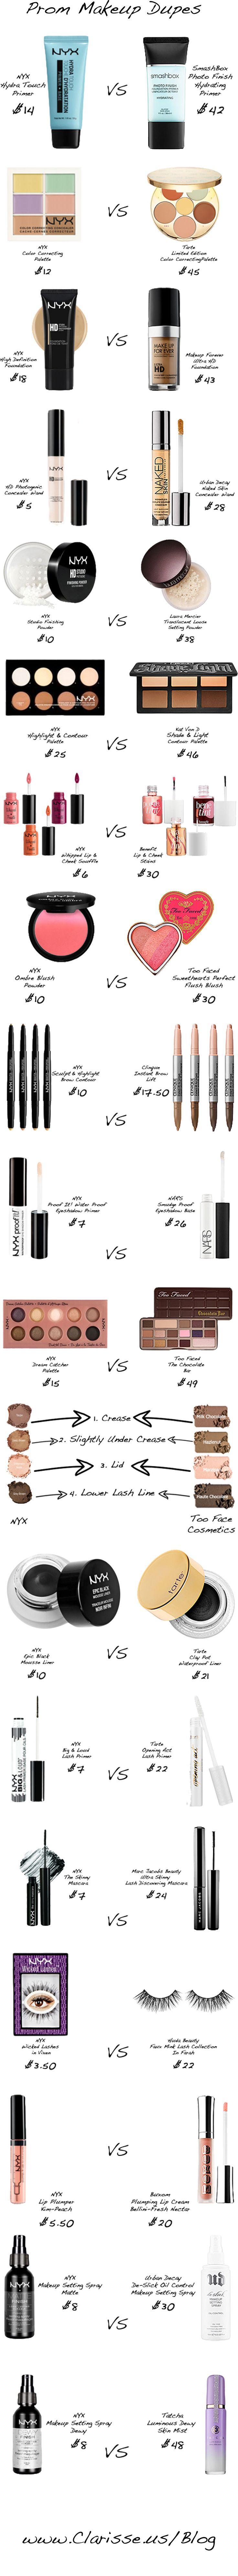 Свадьба - Prom Makeup Dupes: Splurge Vs Steal